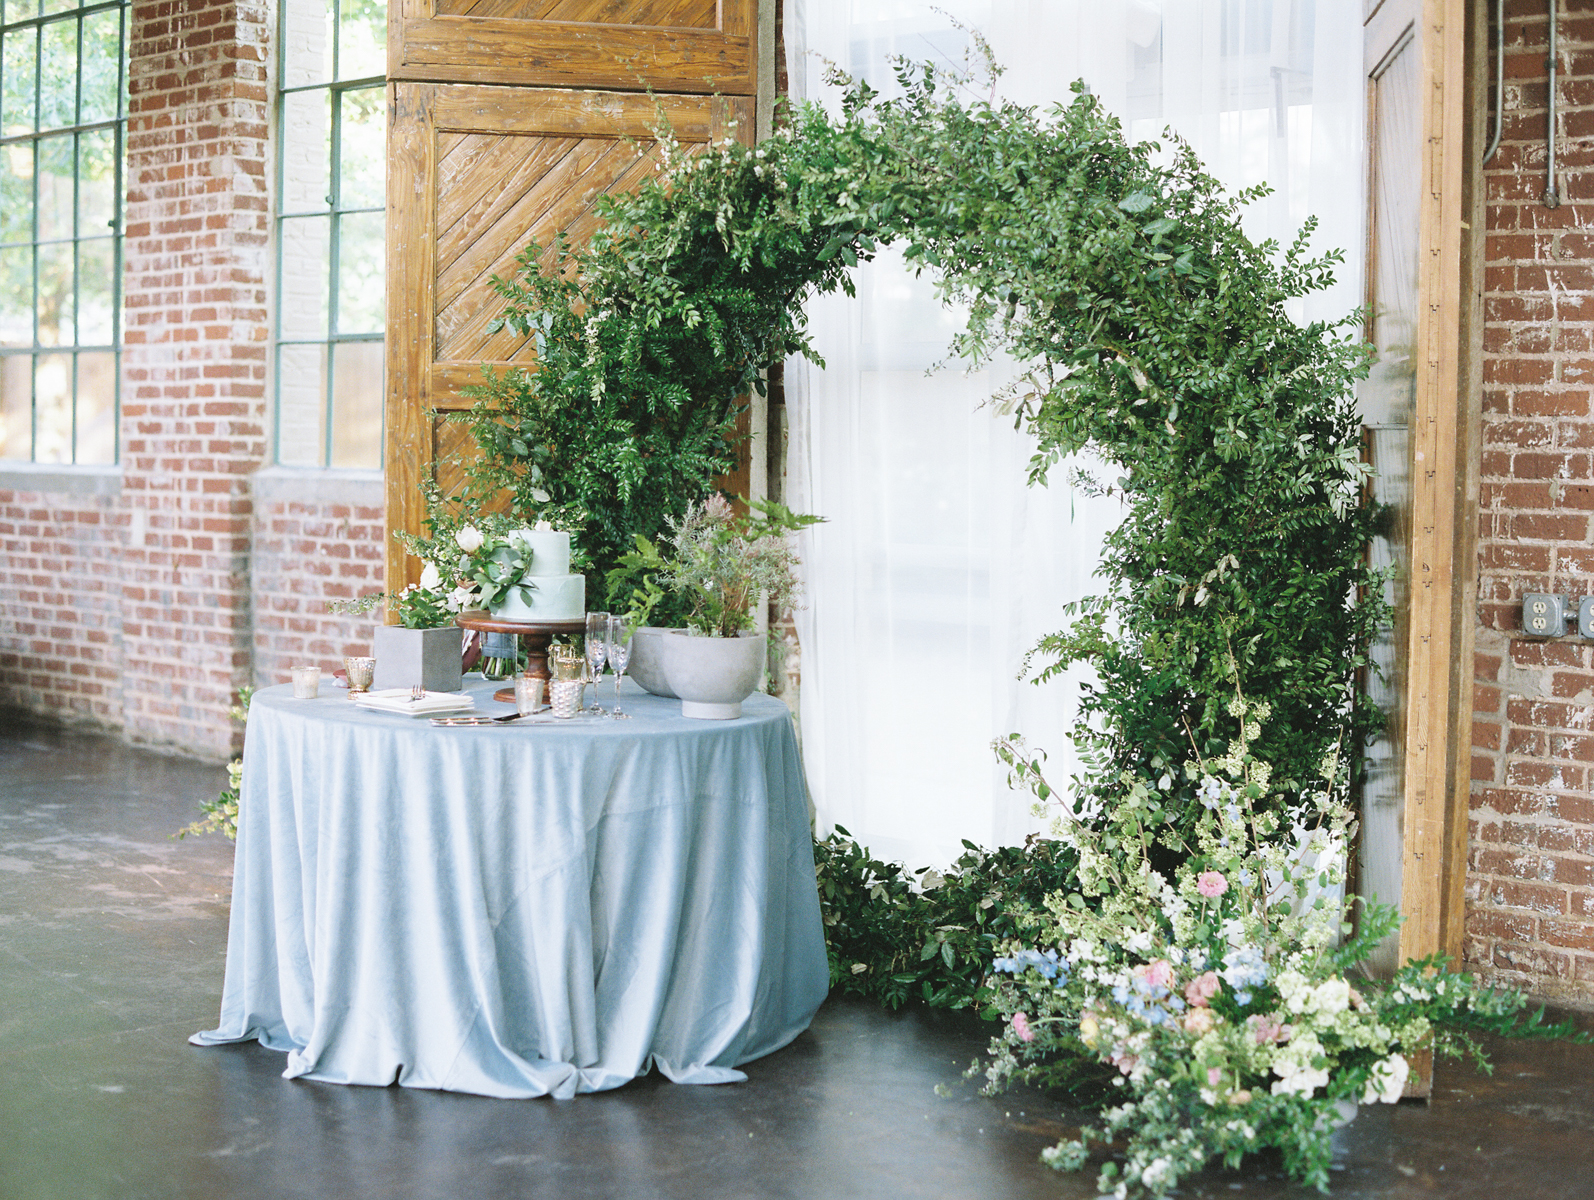 Foundry-At-Puritan-Mill-wedding-photos-venue-atlanta-fine-art-film-photographer58.JPG